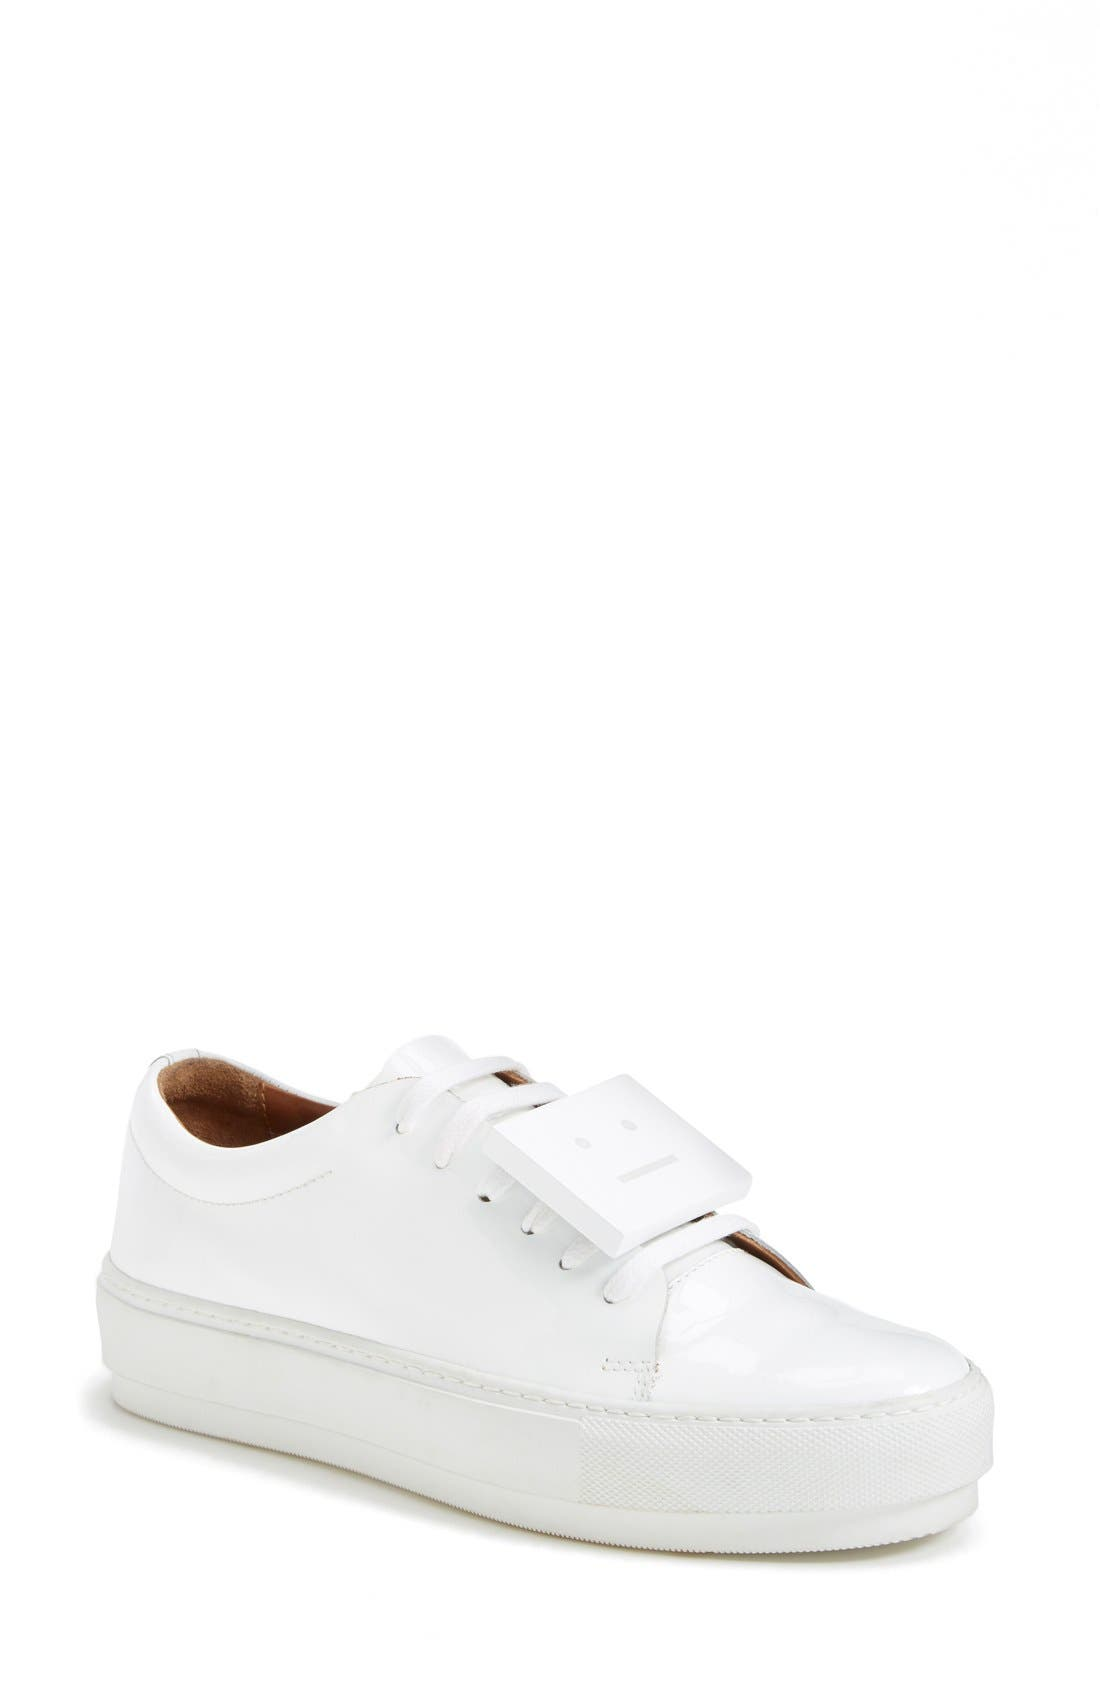 Acne Studios Adriana Leather Sneaker